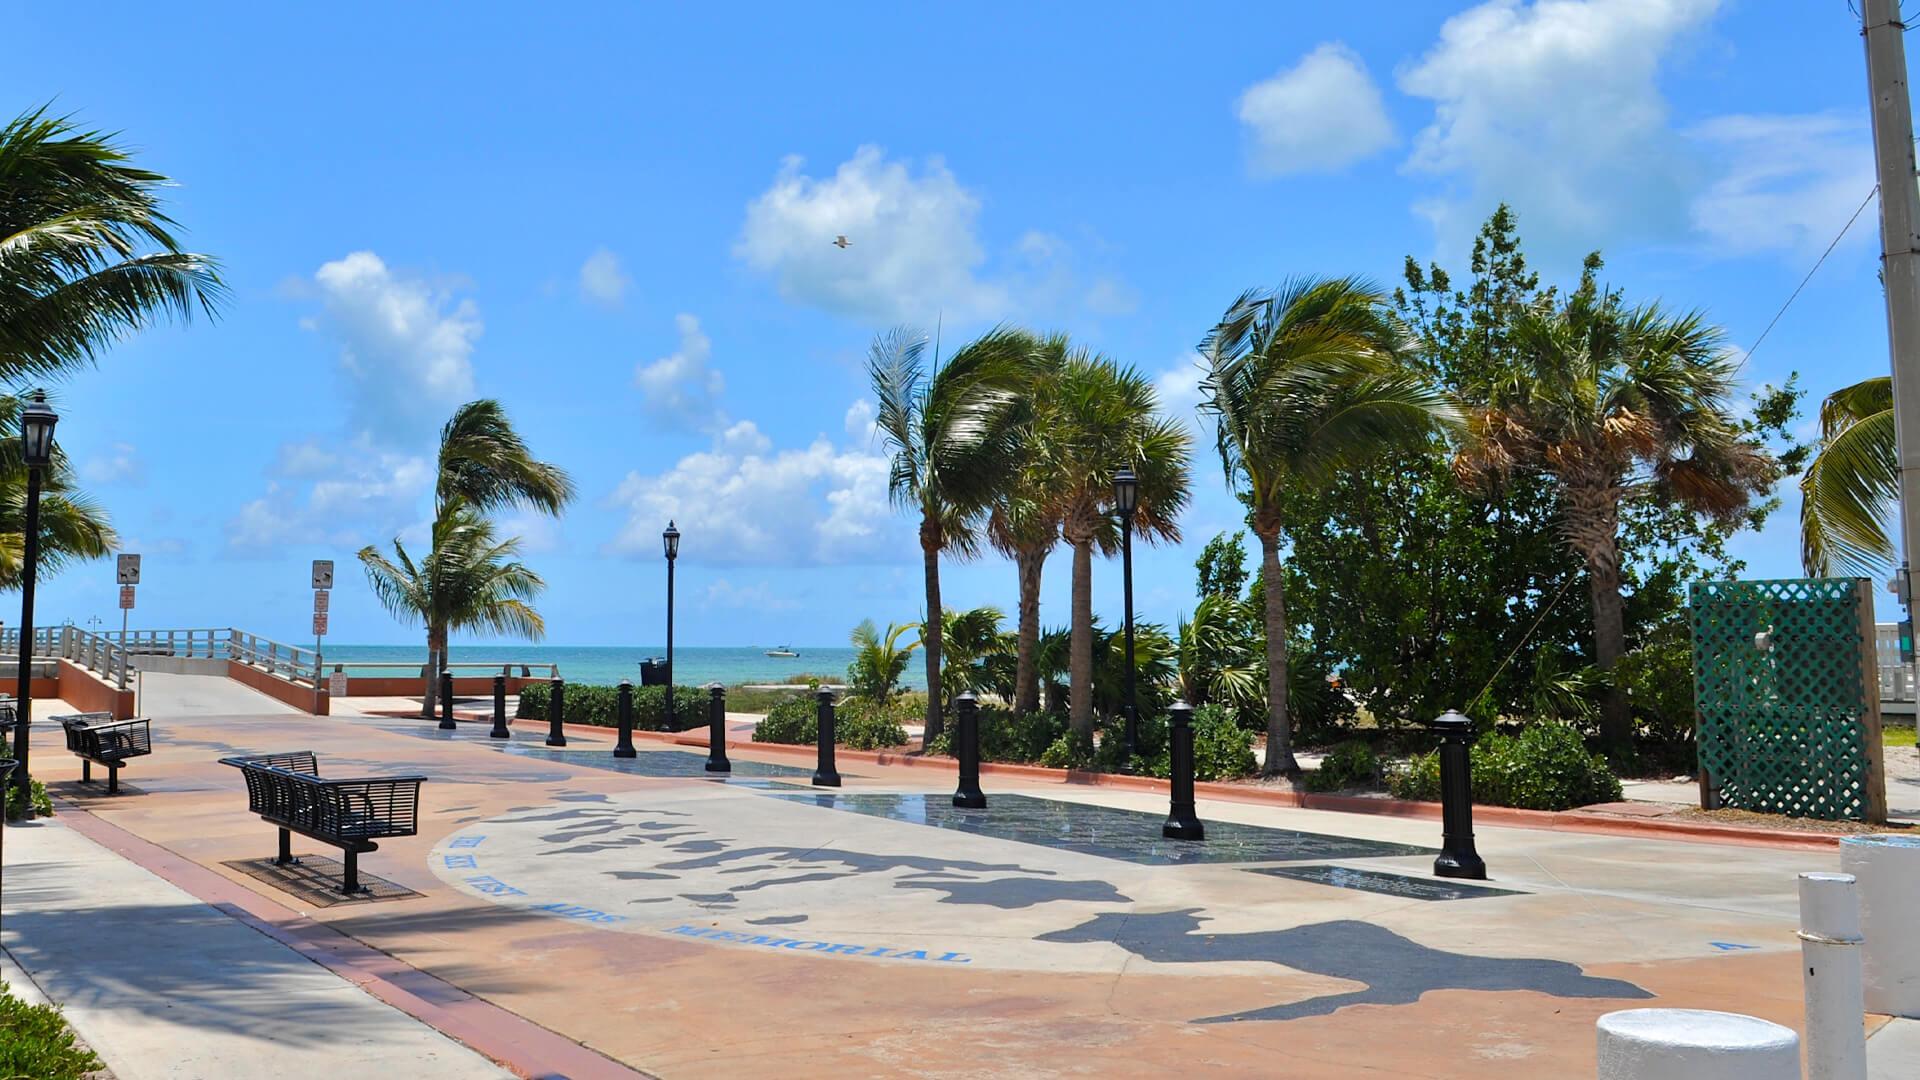 White Street Pier Key West